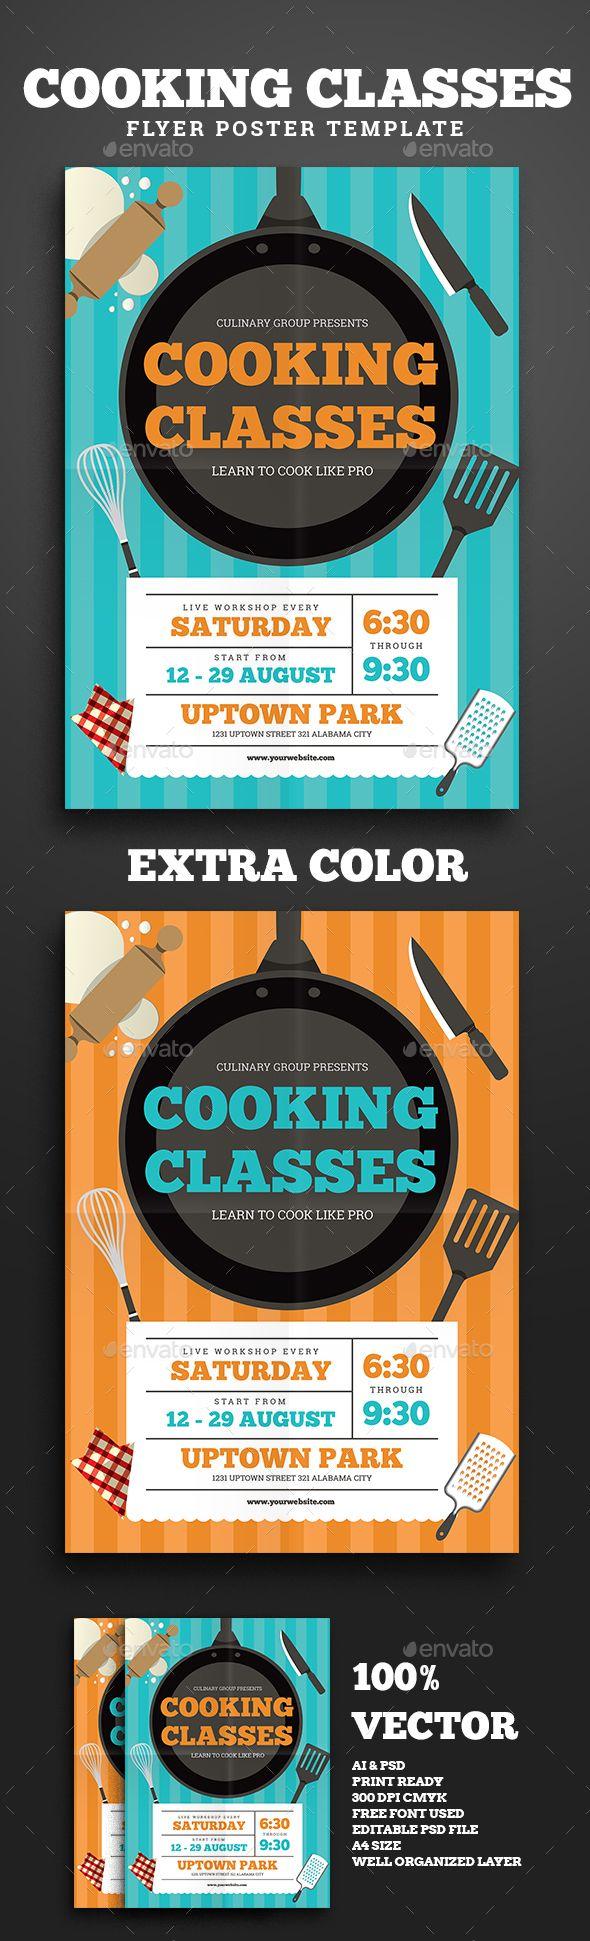 Pin On Para Cocinar Cooking class flyer template free